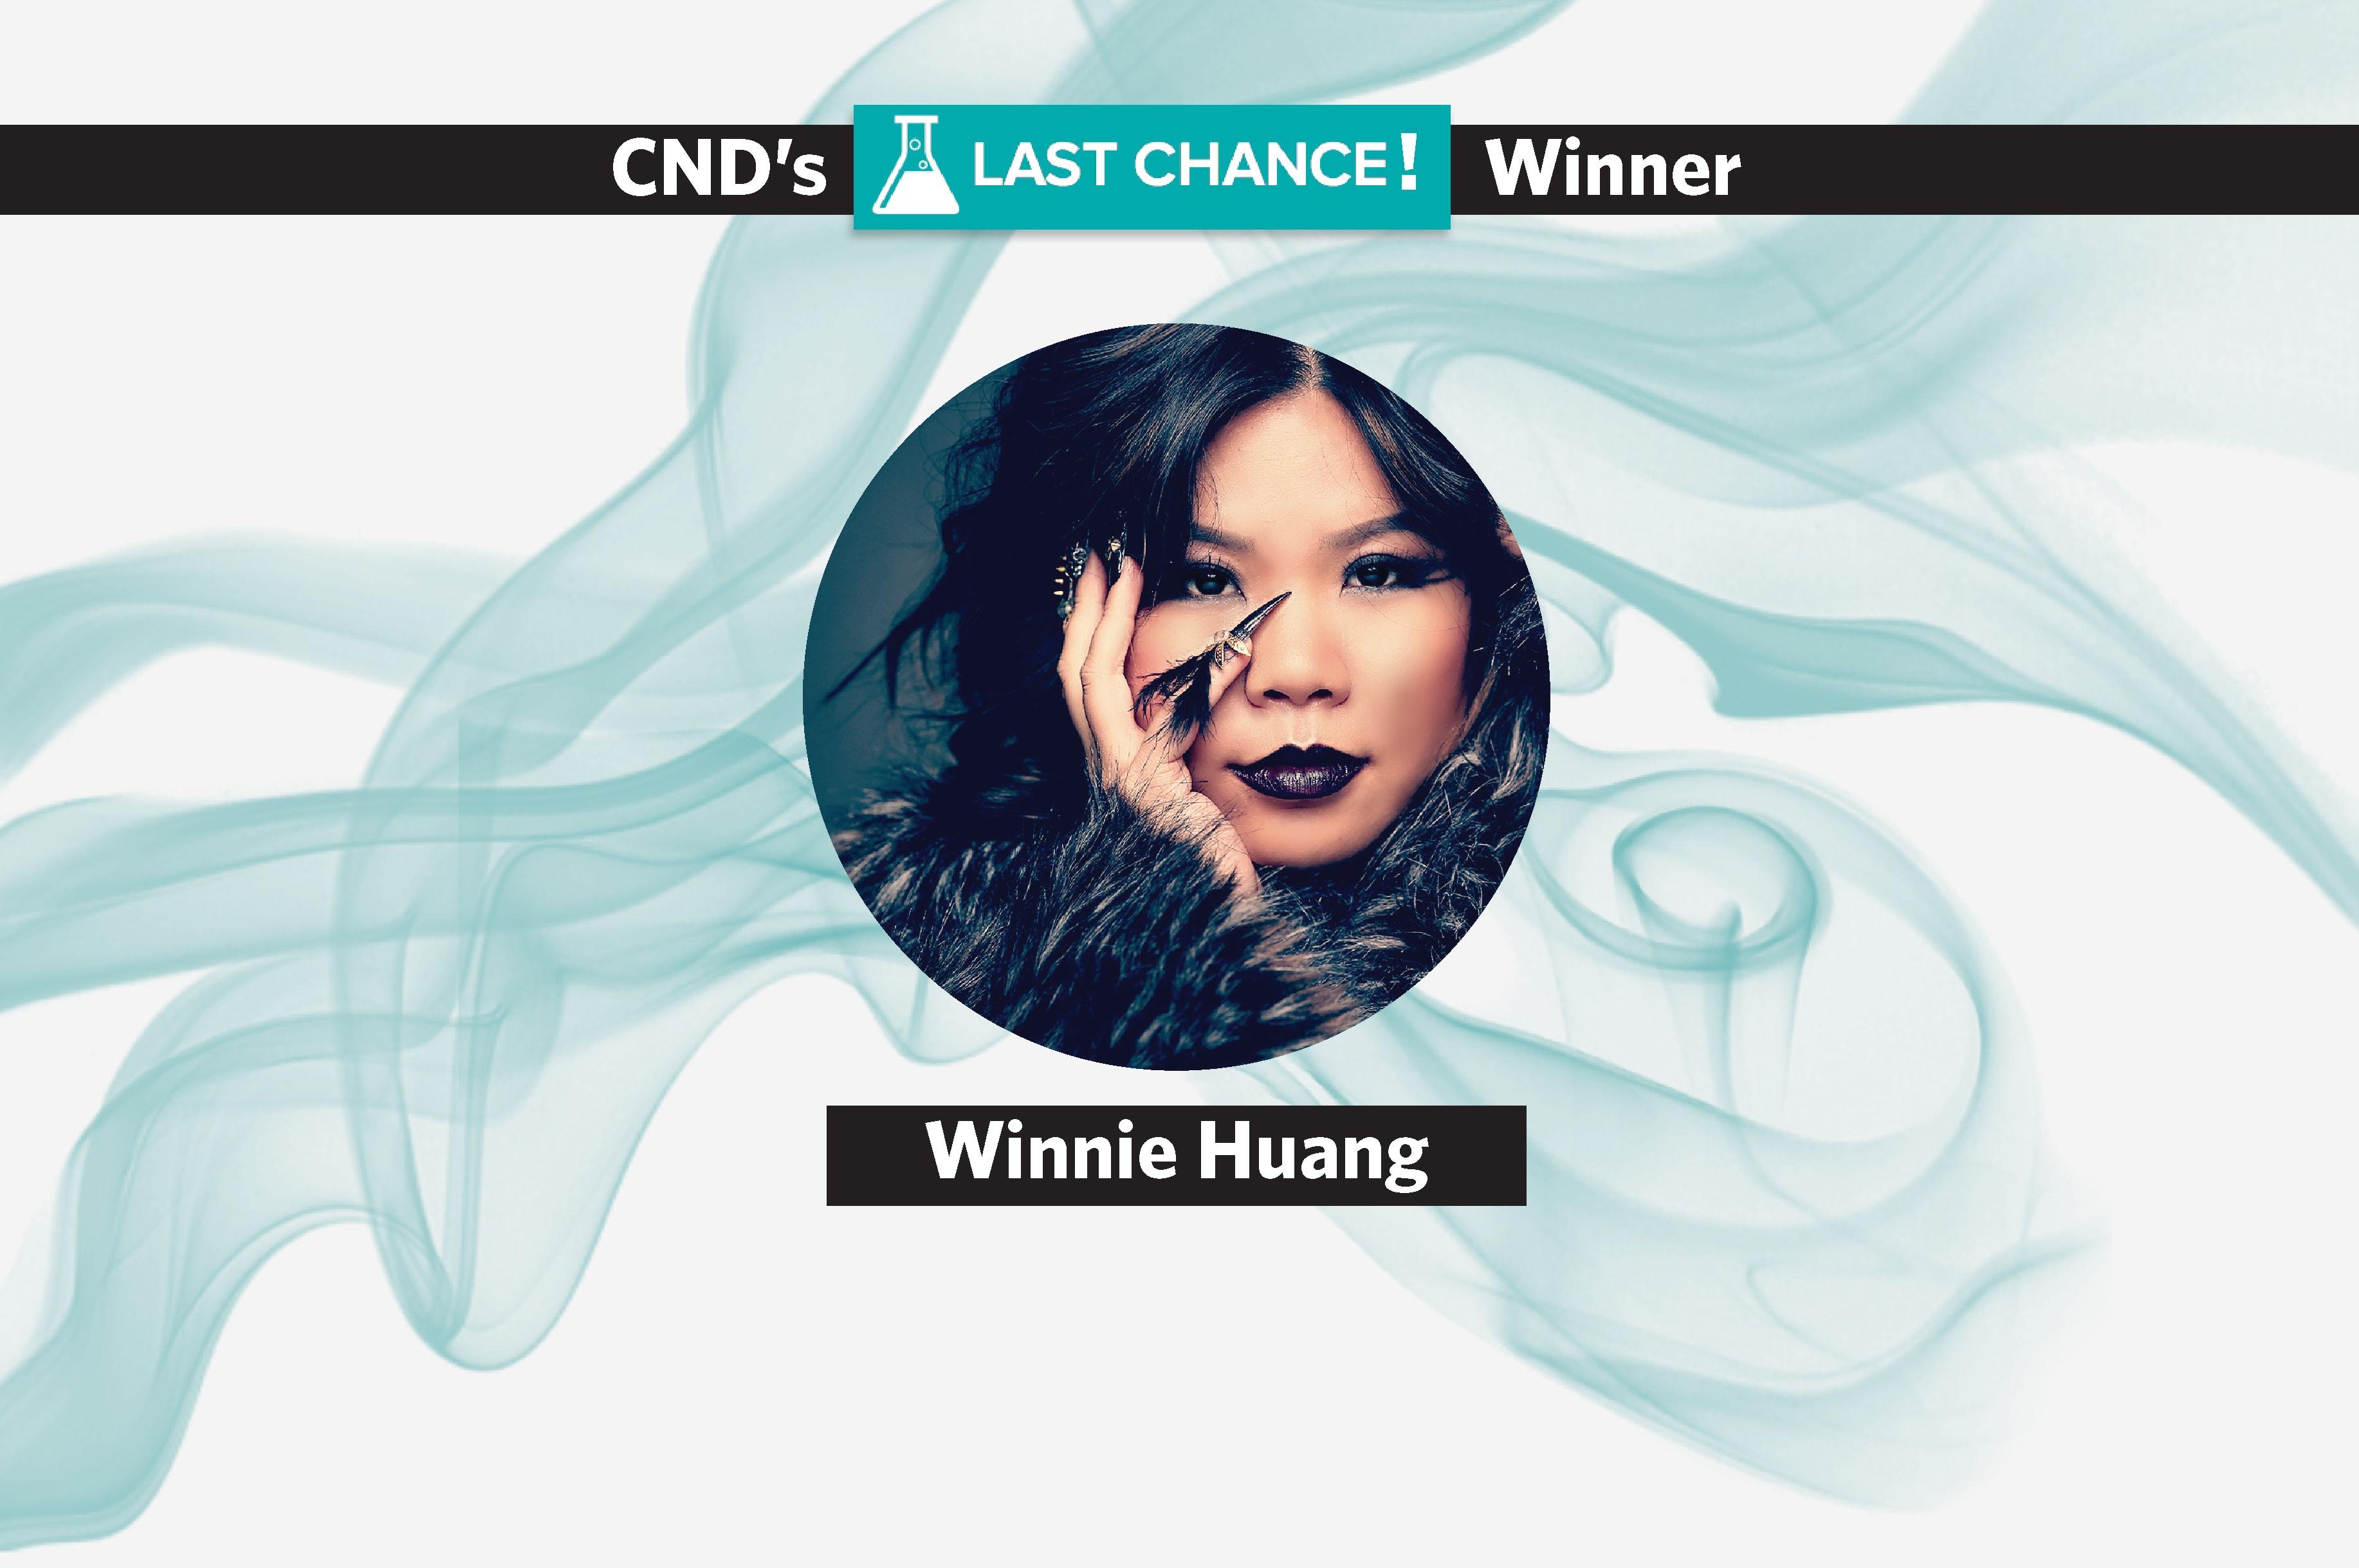 LastChance-wk10-winner